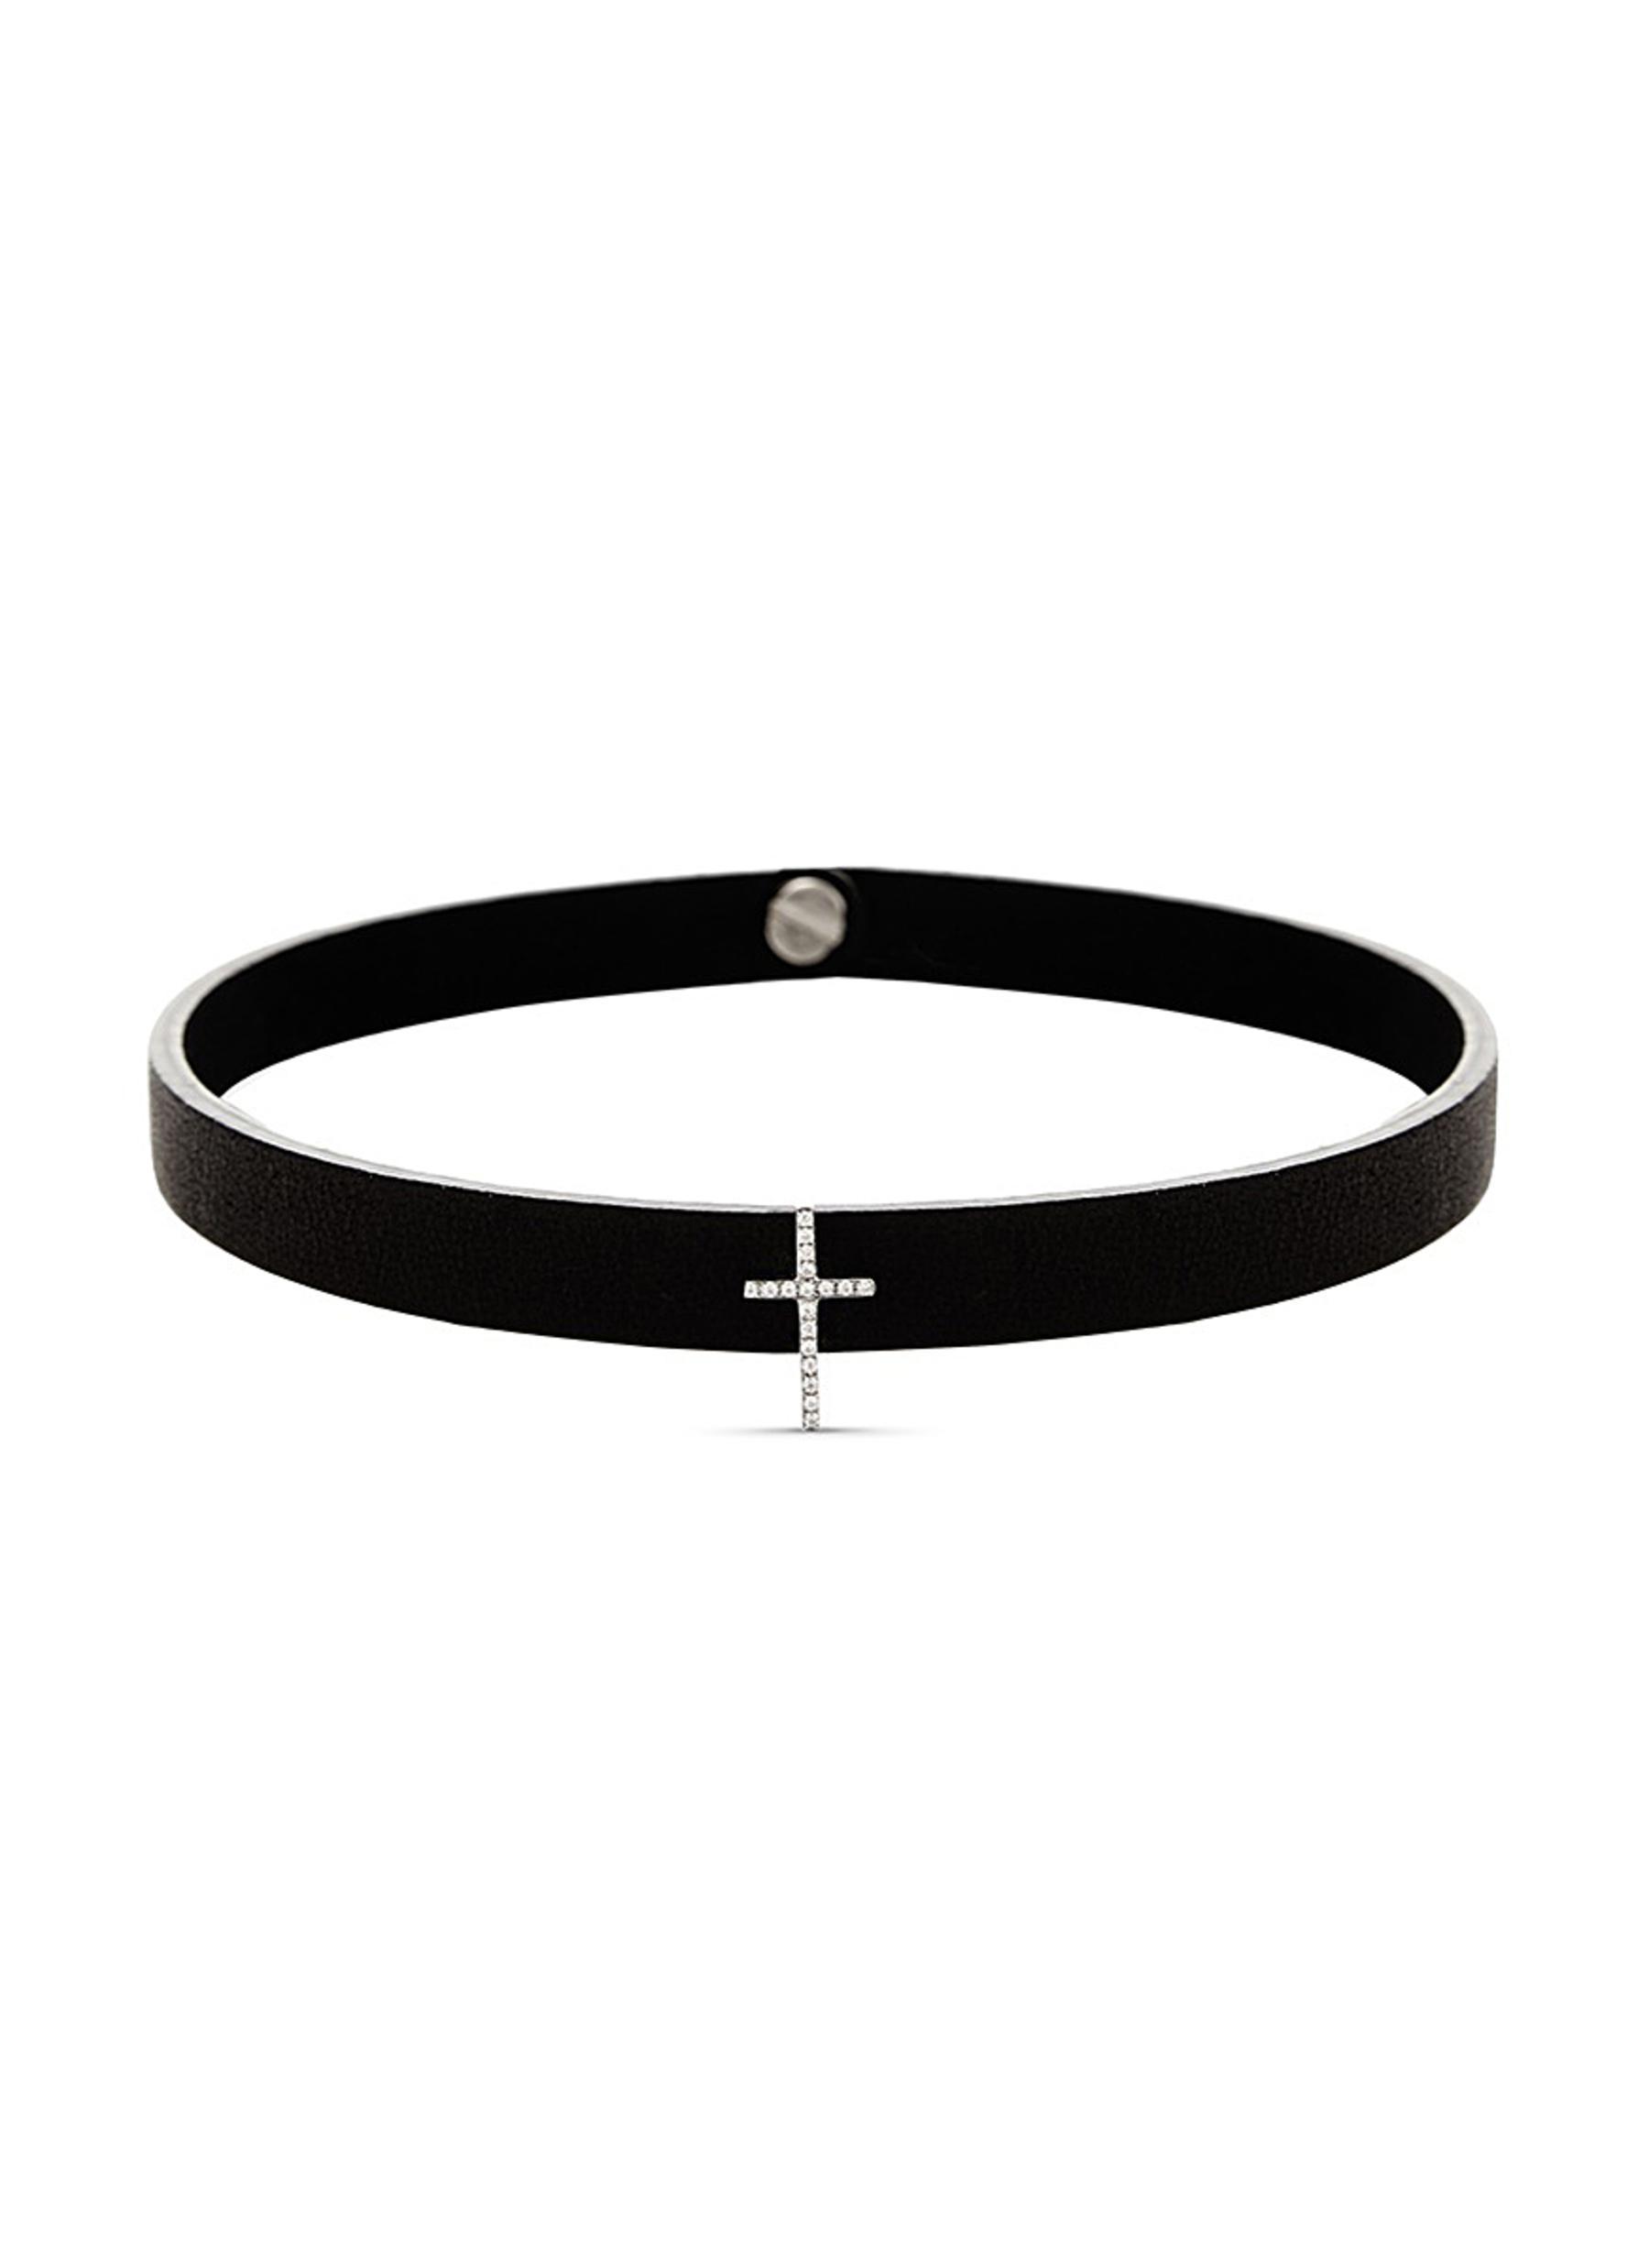 LYNN BAN 'Pavé Cross Stud' diamond leather choker